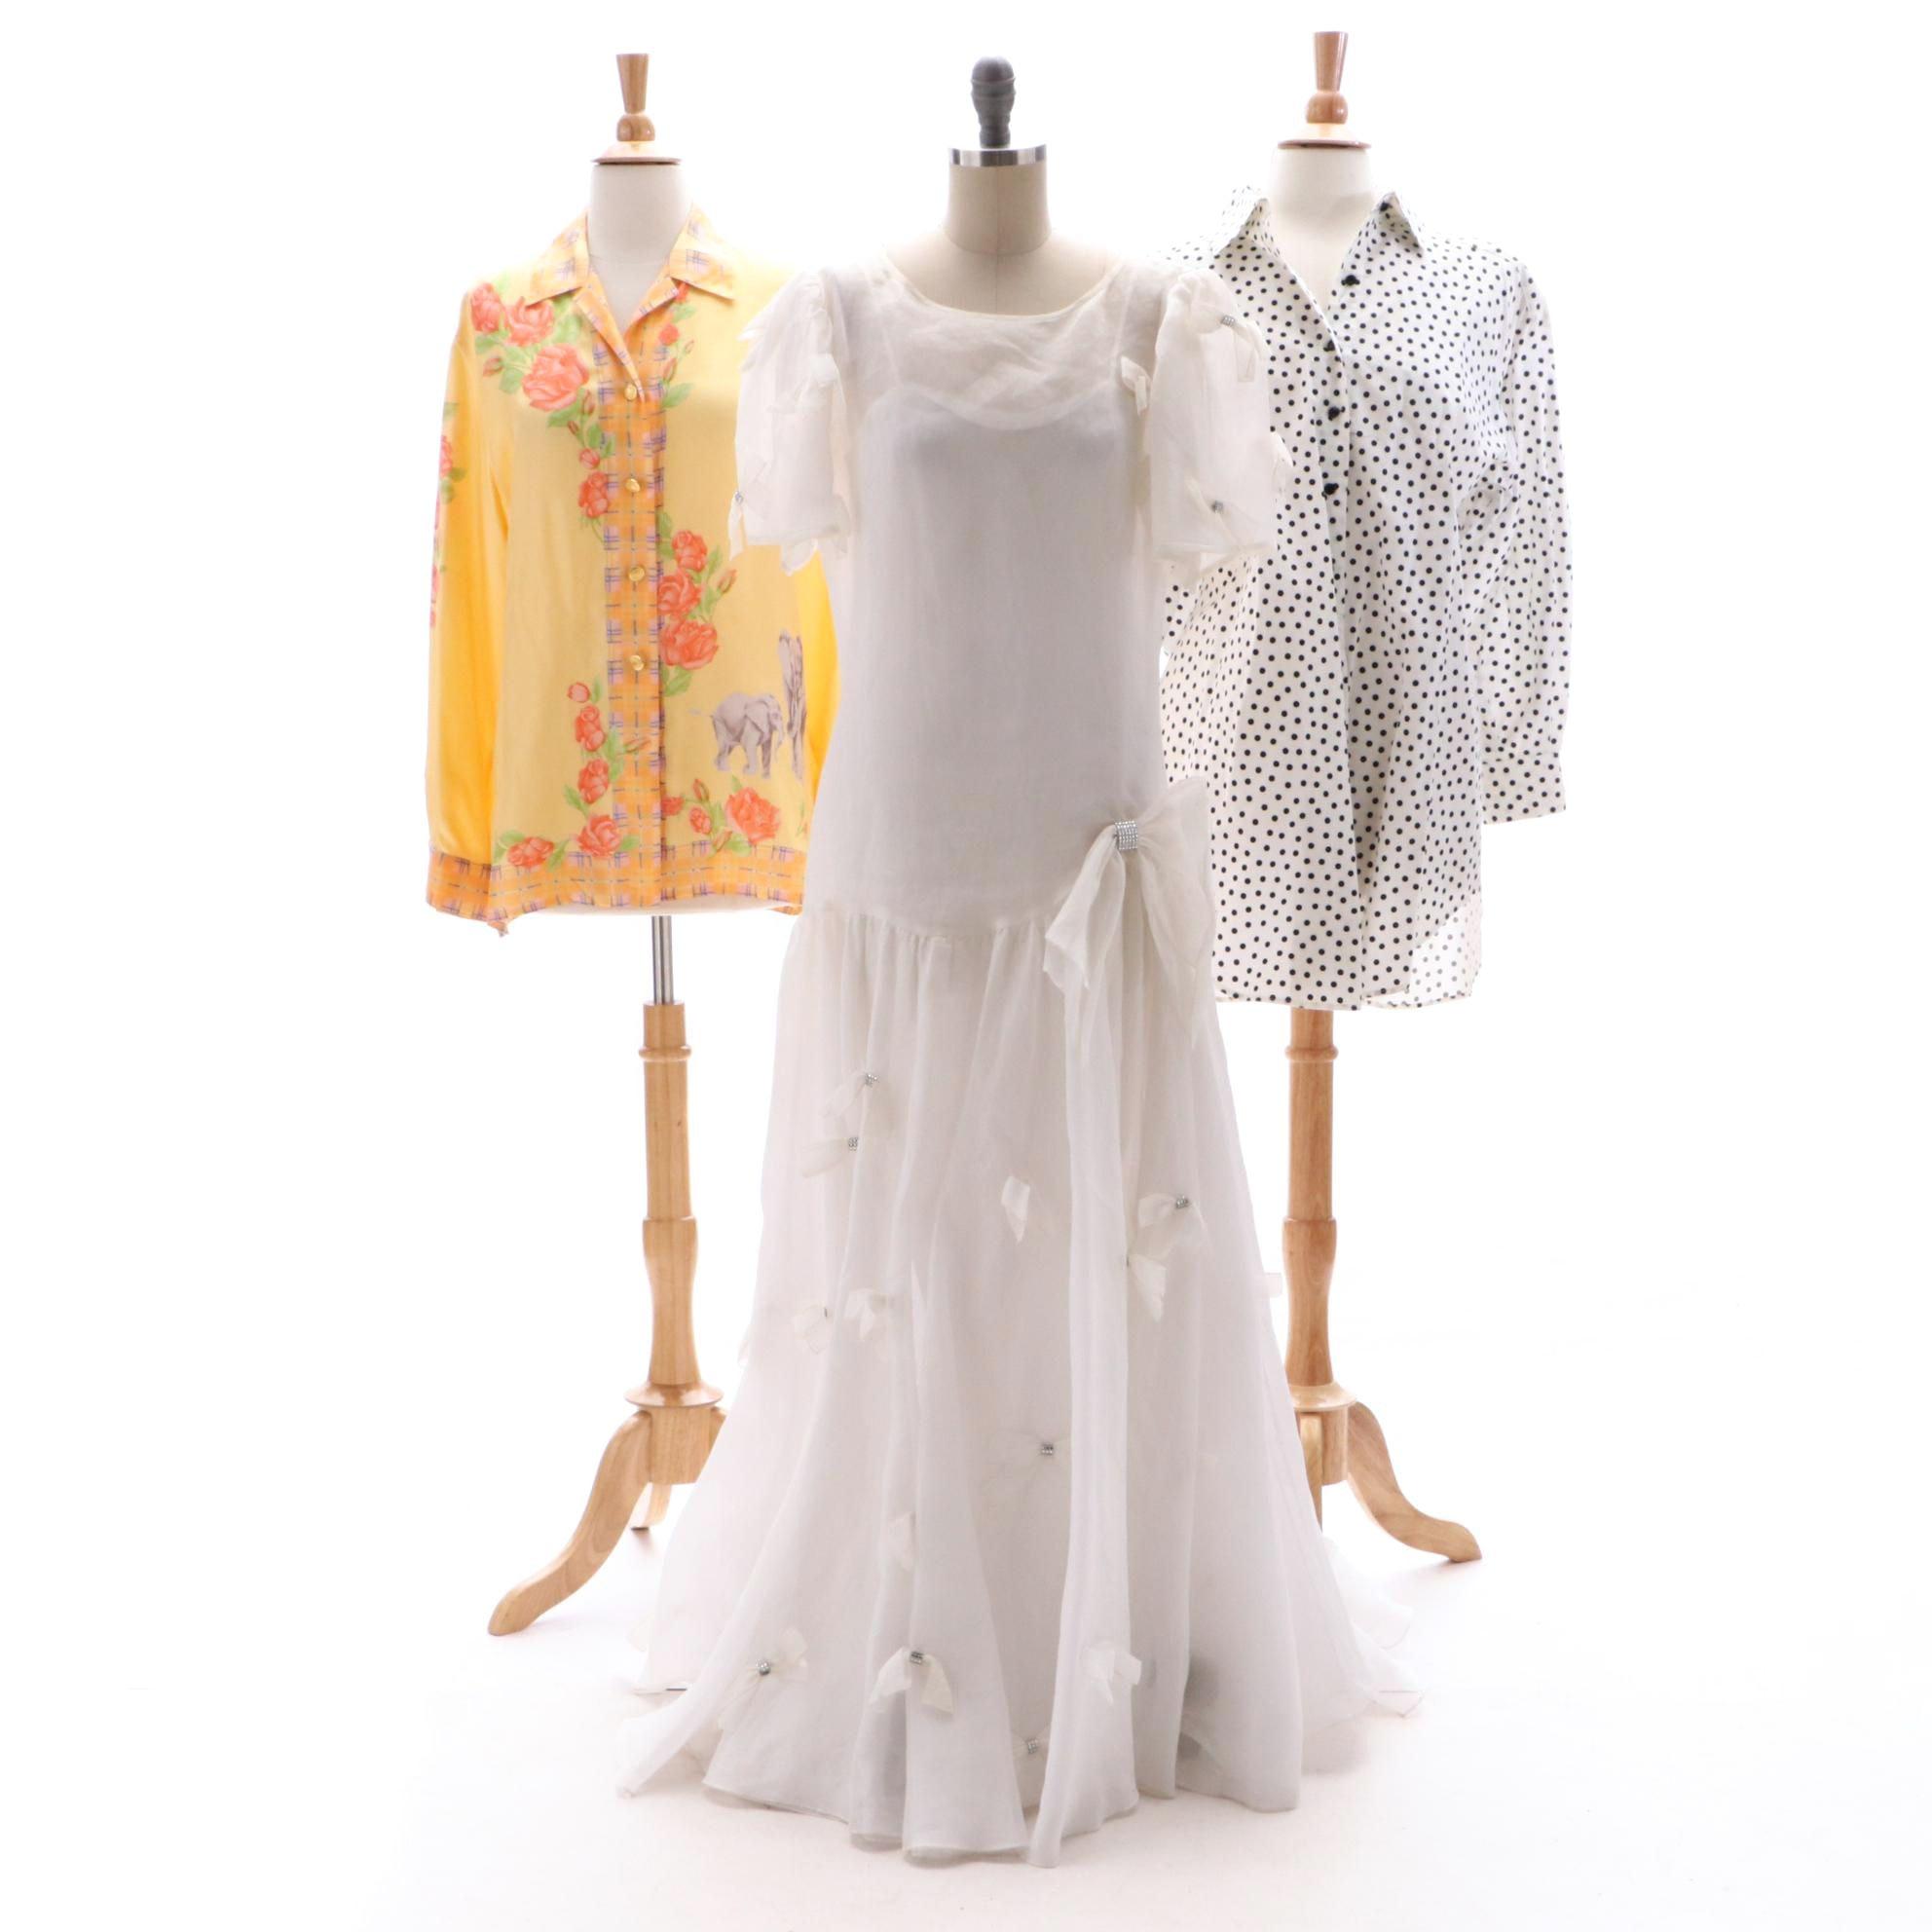 Bill Blass and Escada Shirts and an Unlabeled Formal Dress